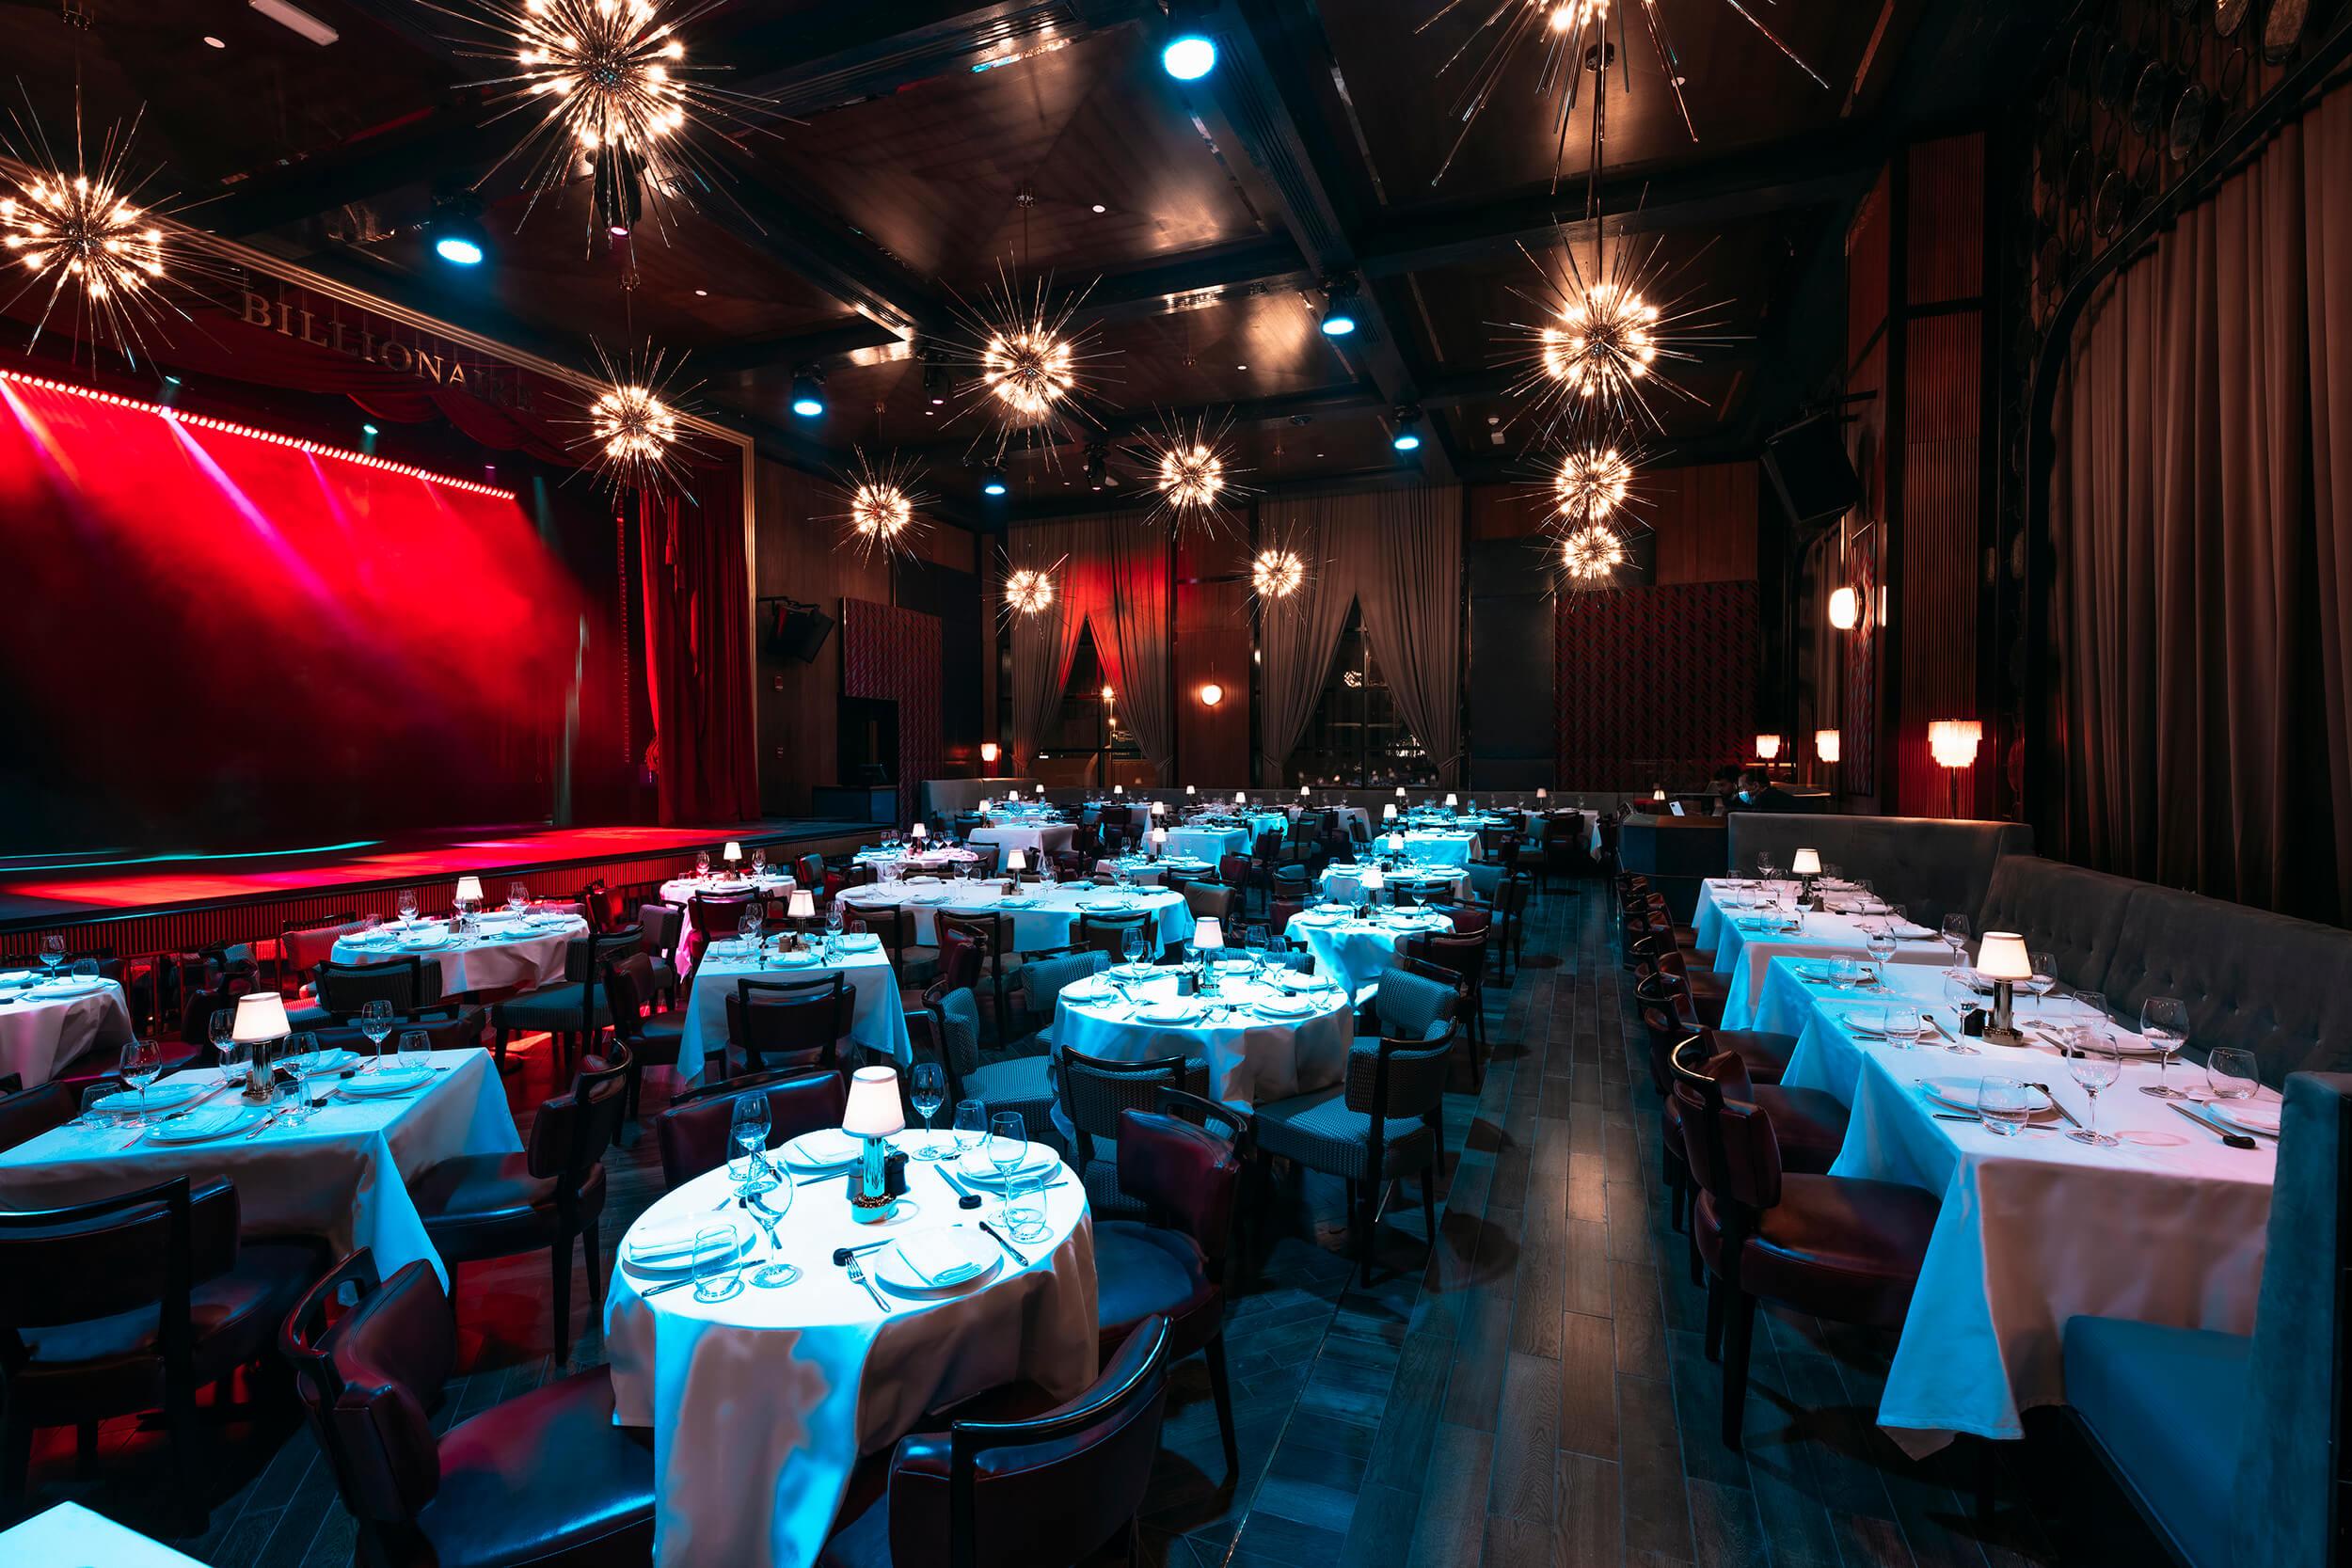 Venue at Billionaire Dubai